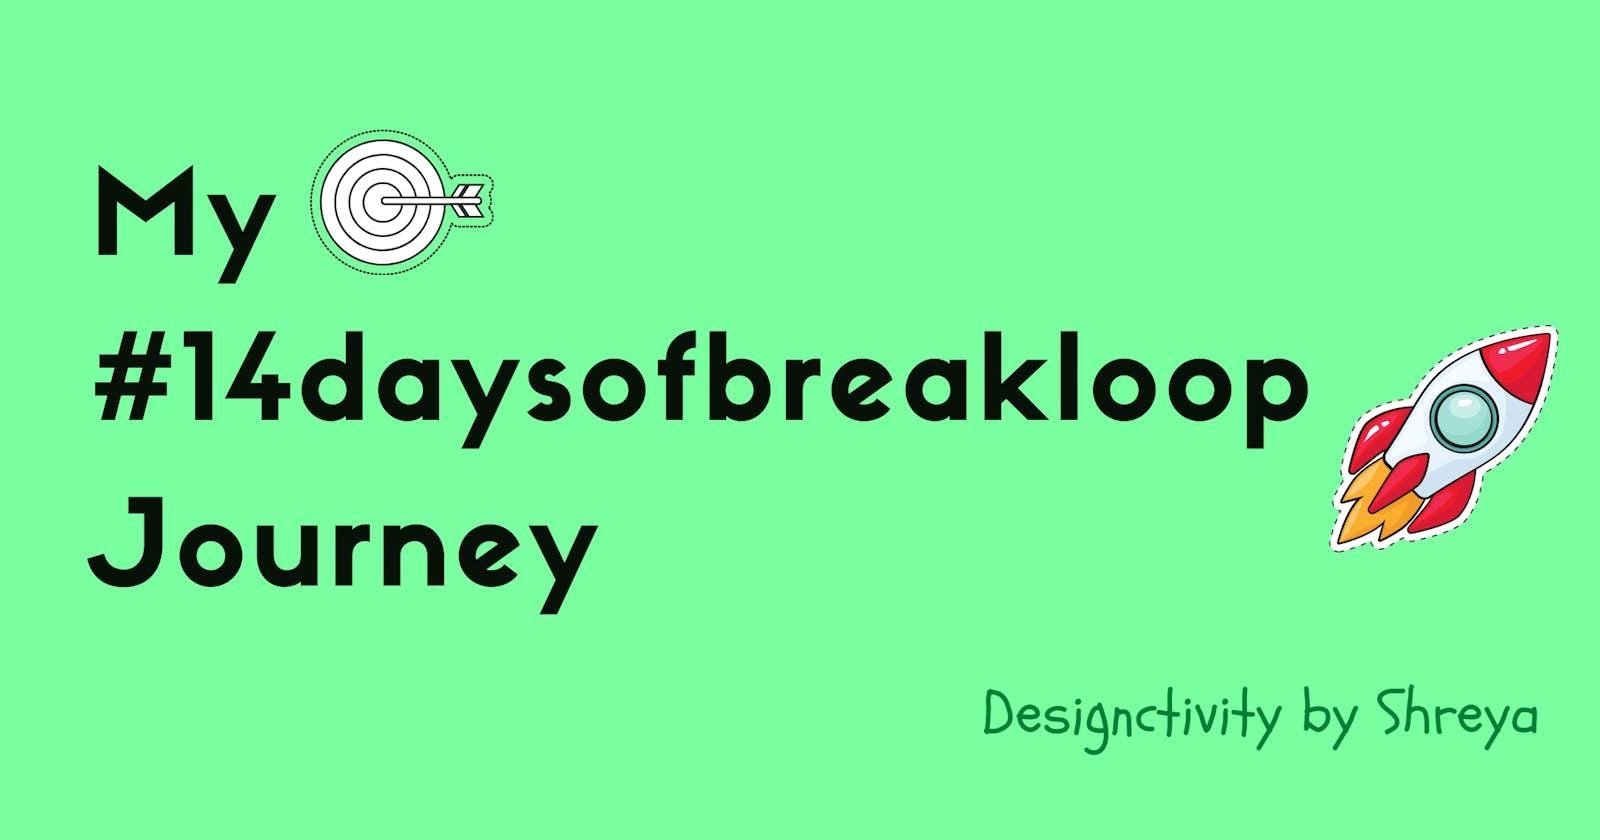 My #14daysofbreakloop Journey